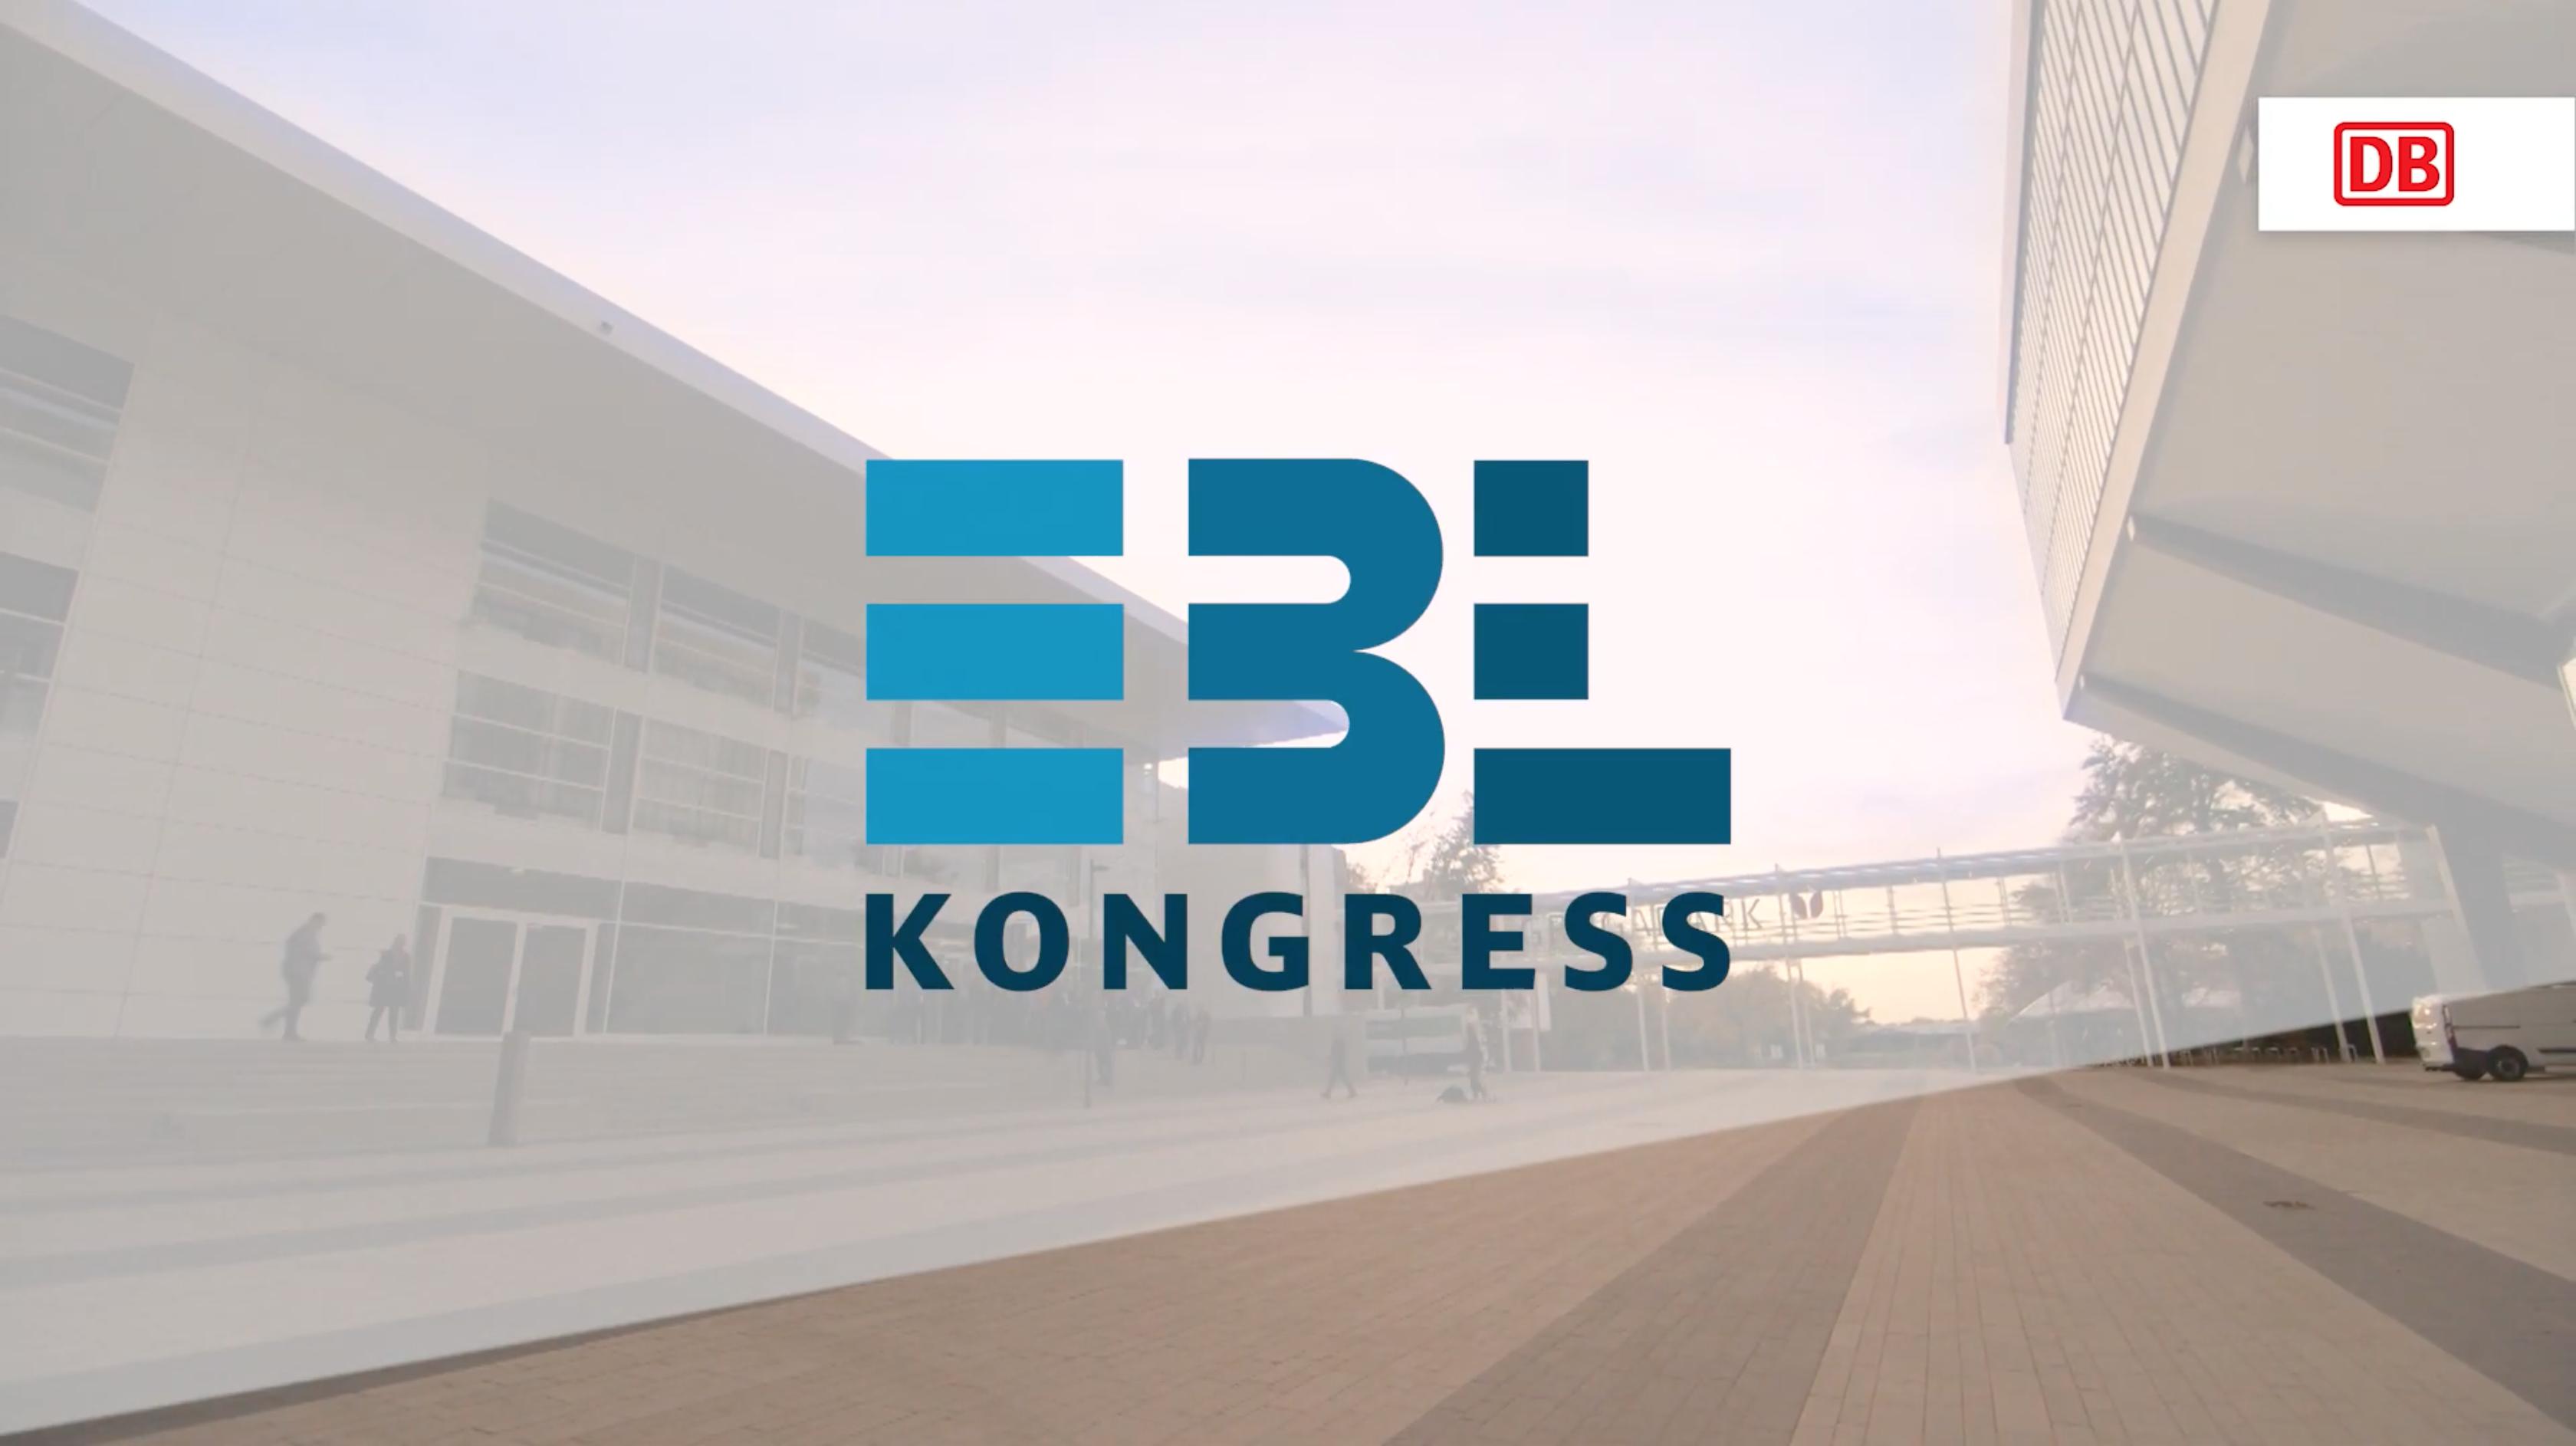 Deutsche Bahn, EBL Kongress